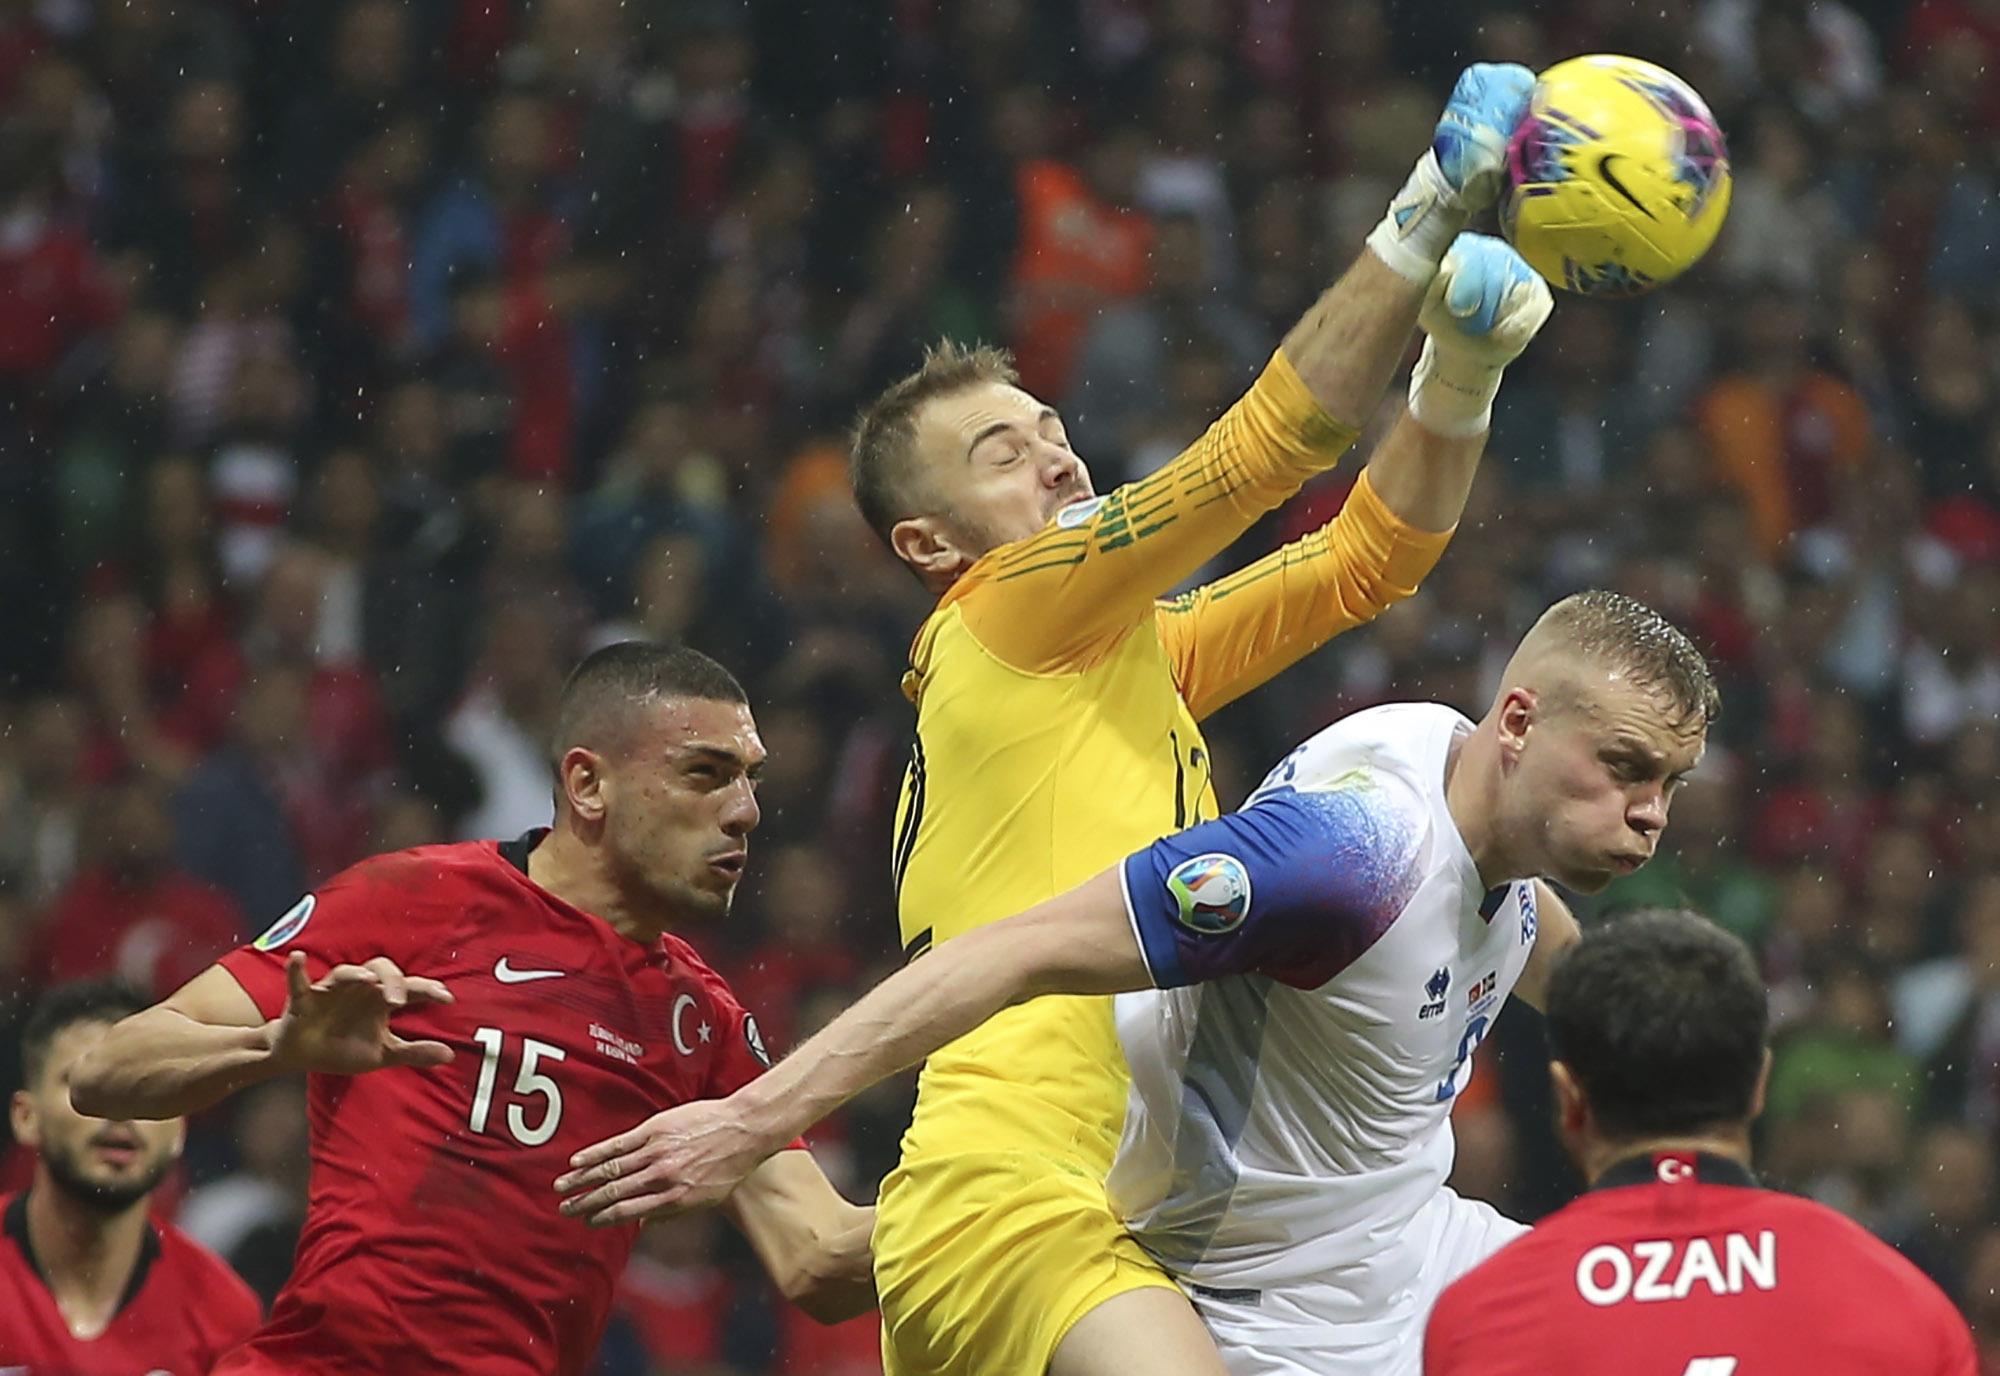 Calendrier Match Foot Euro 2020.England Czech Republic France And Turkey Reach Euro 2020